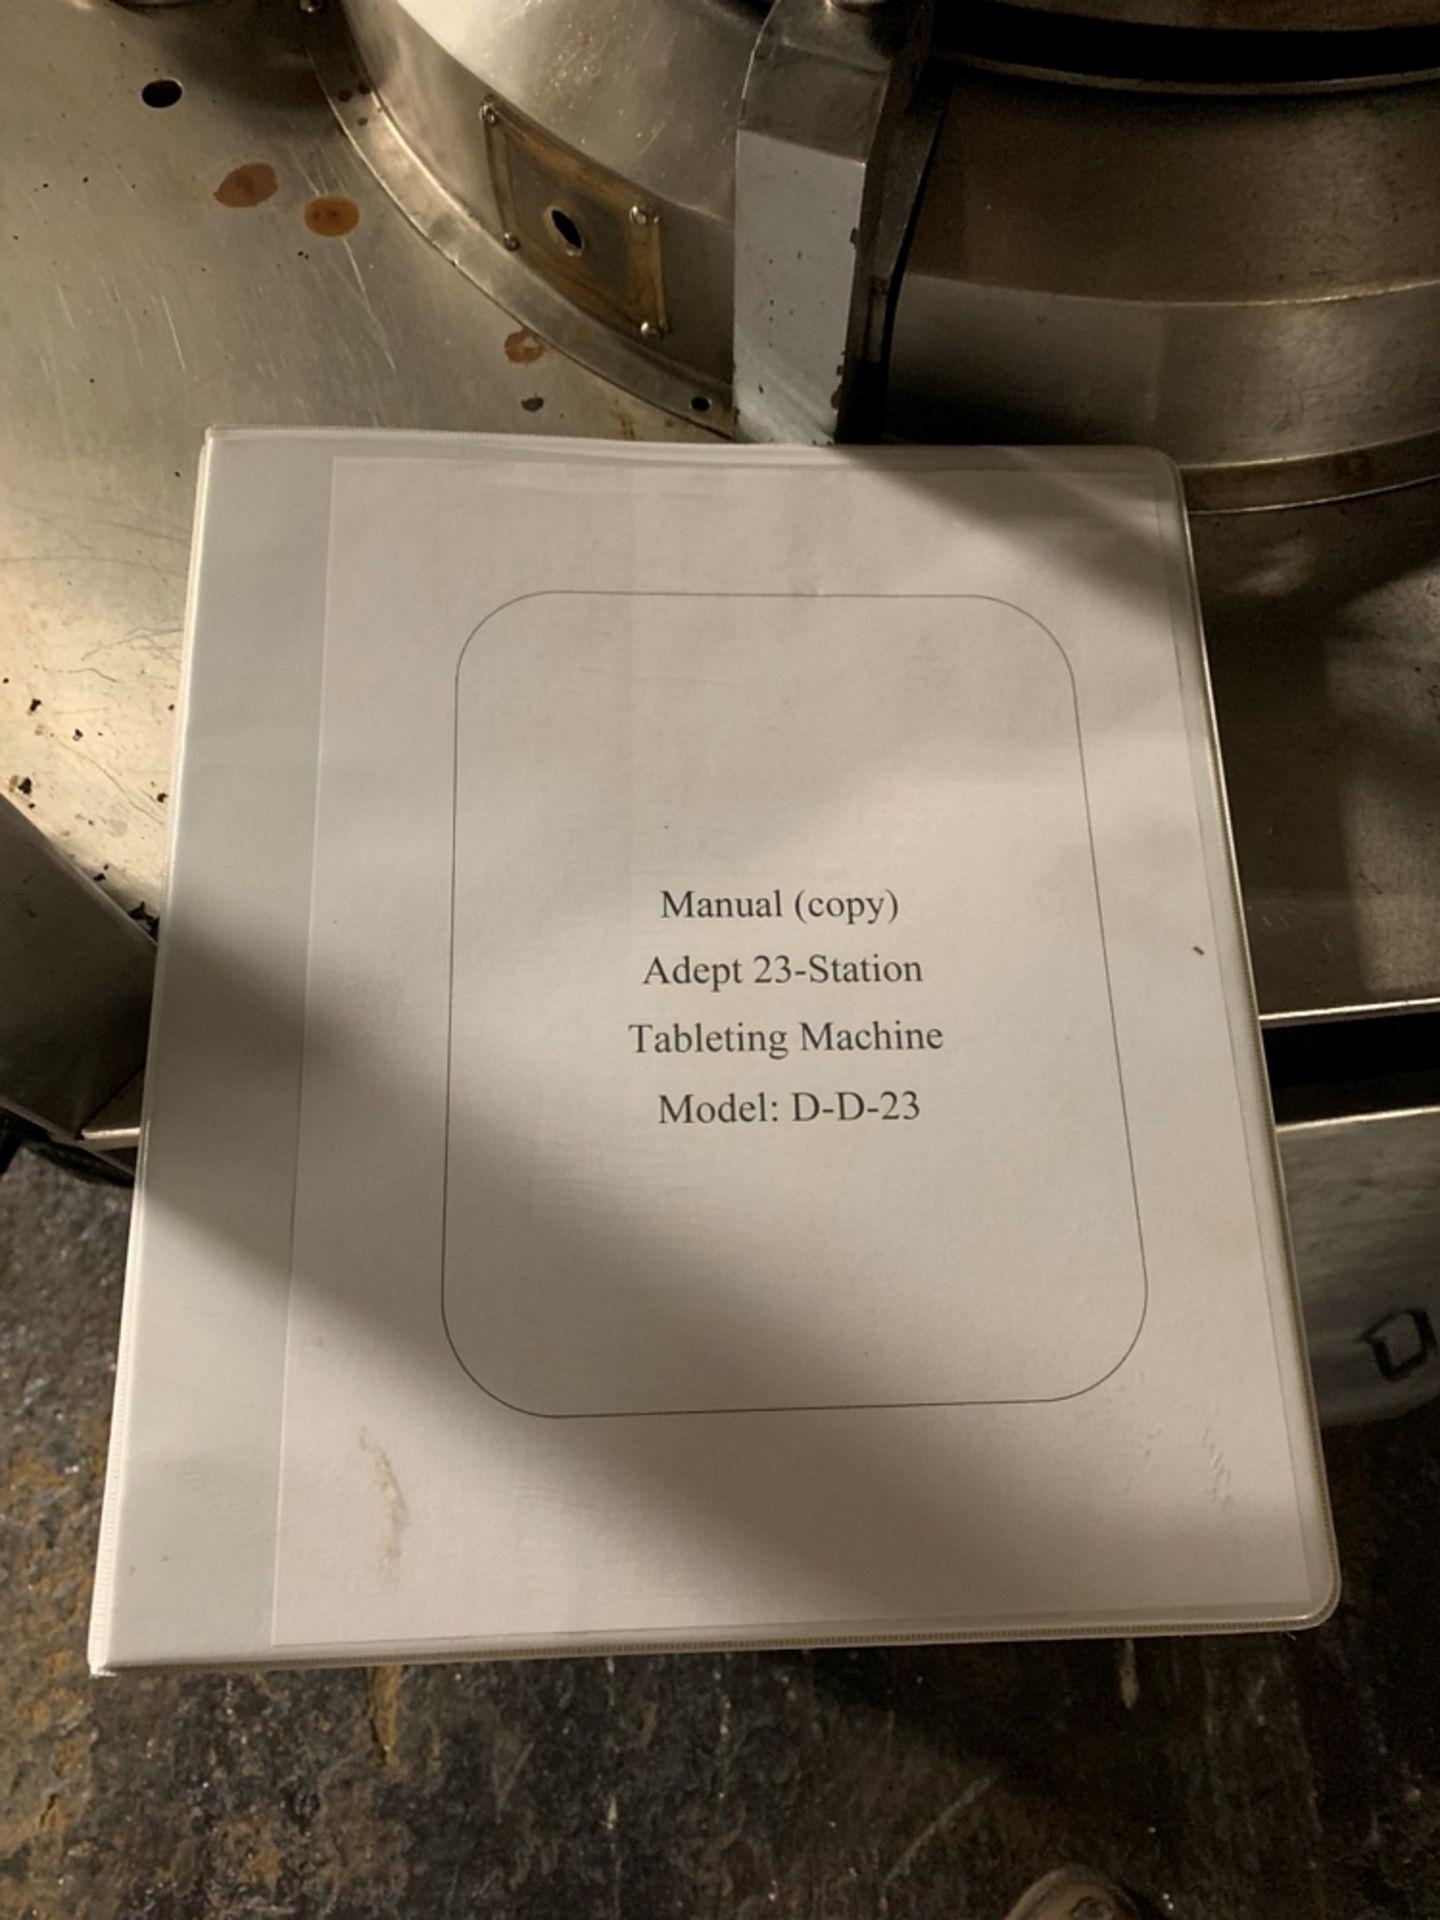 Lot 40 - Adept rotary tablet press, model DD23, 23 station, D tooled, 10 ton compression pressure, 25 mm